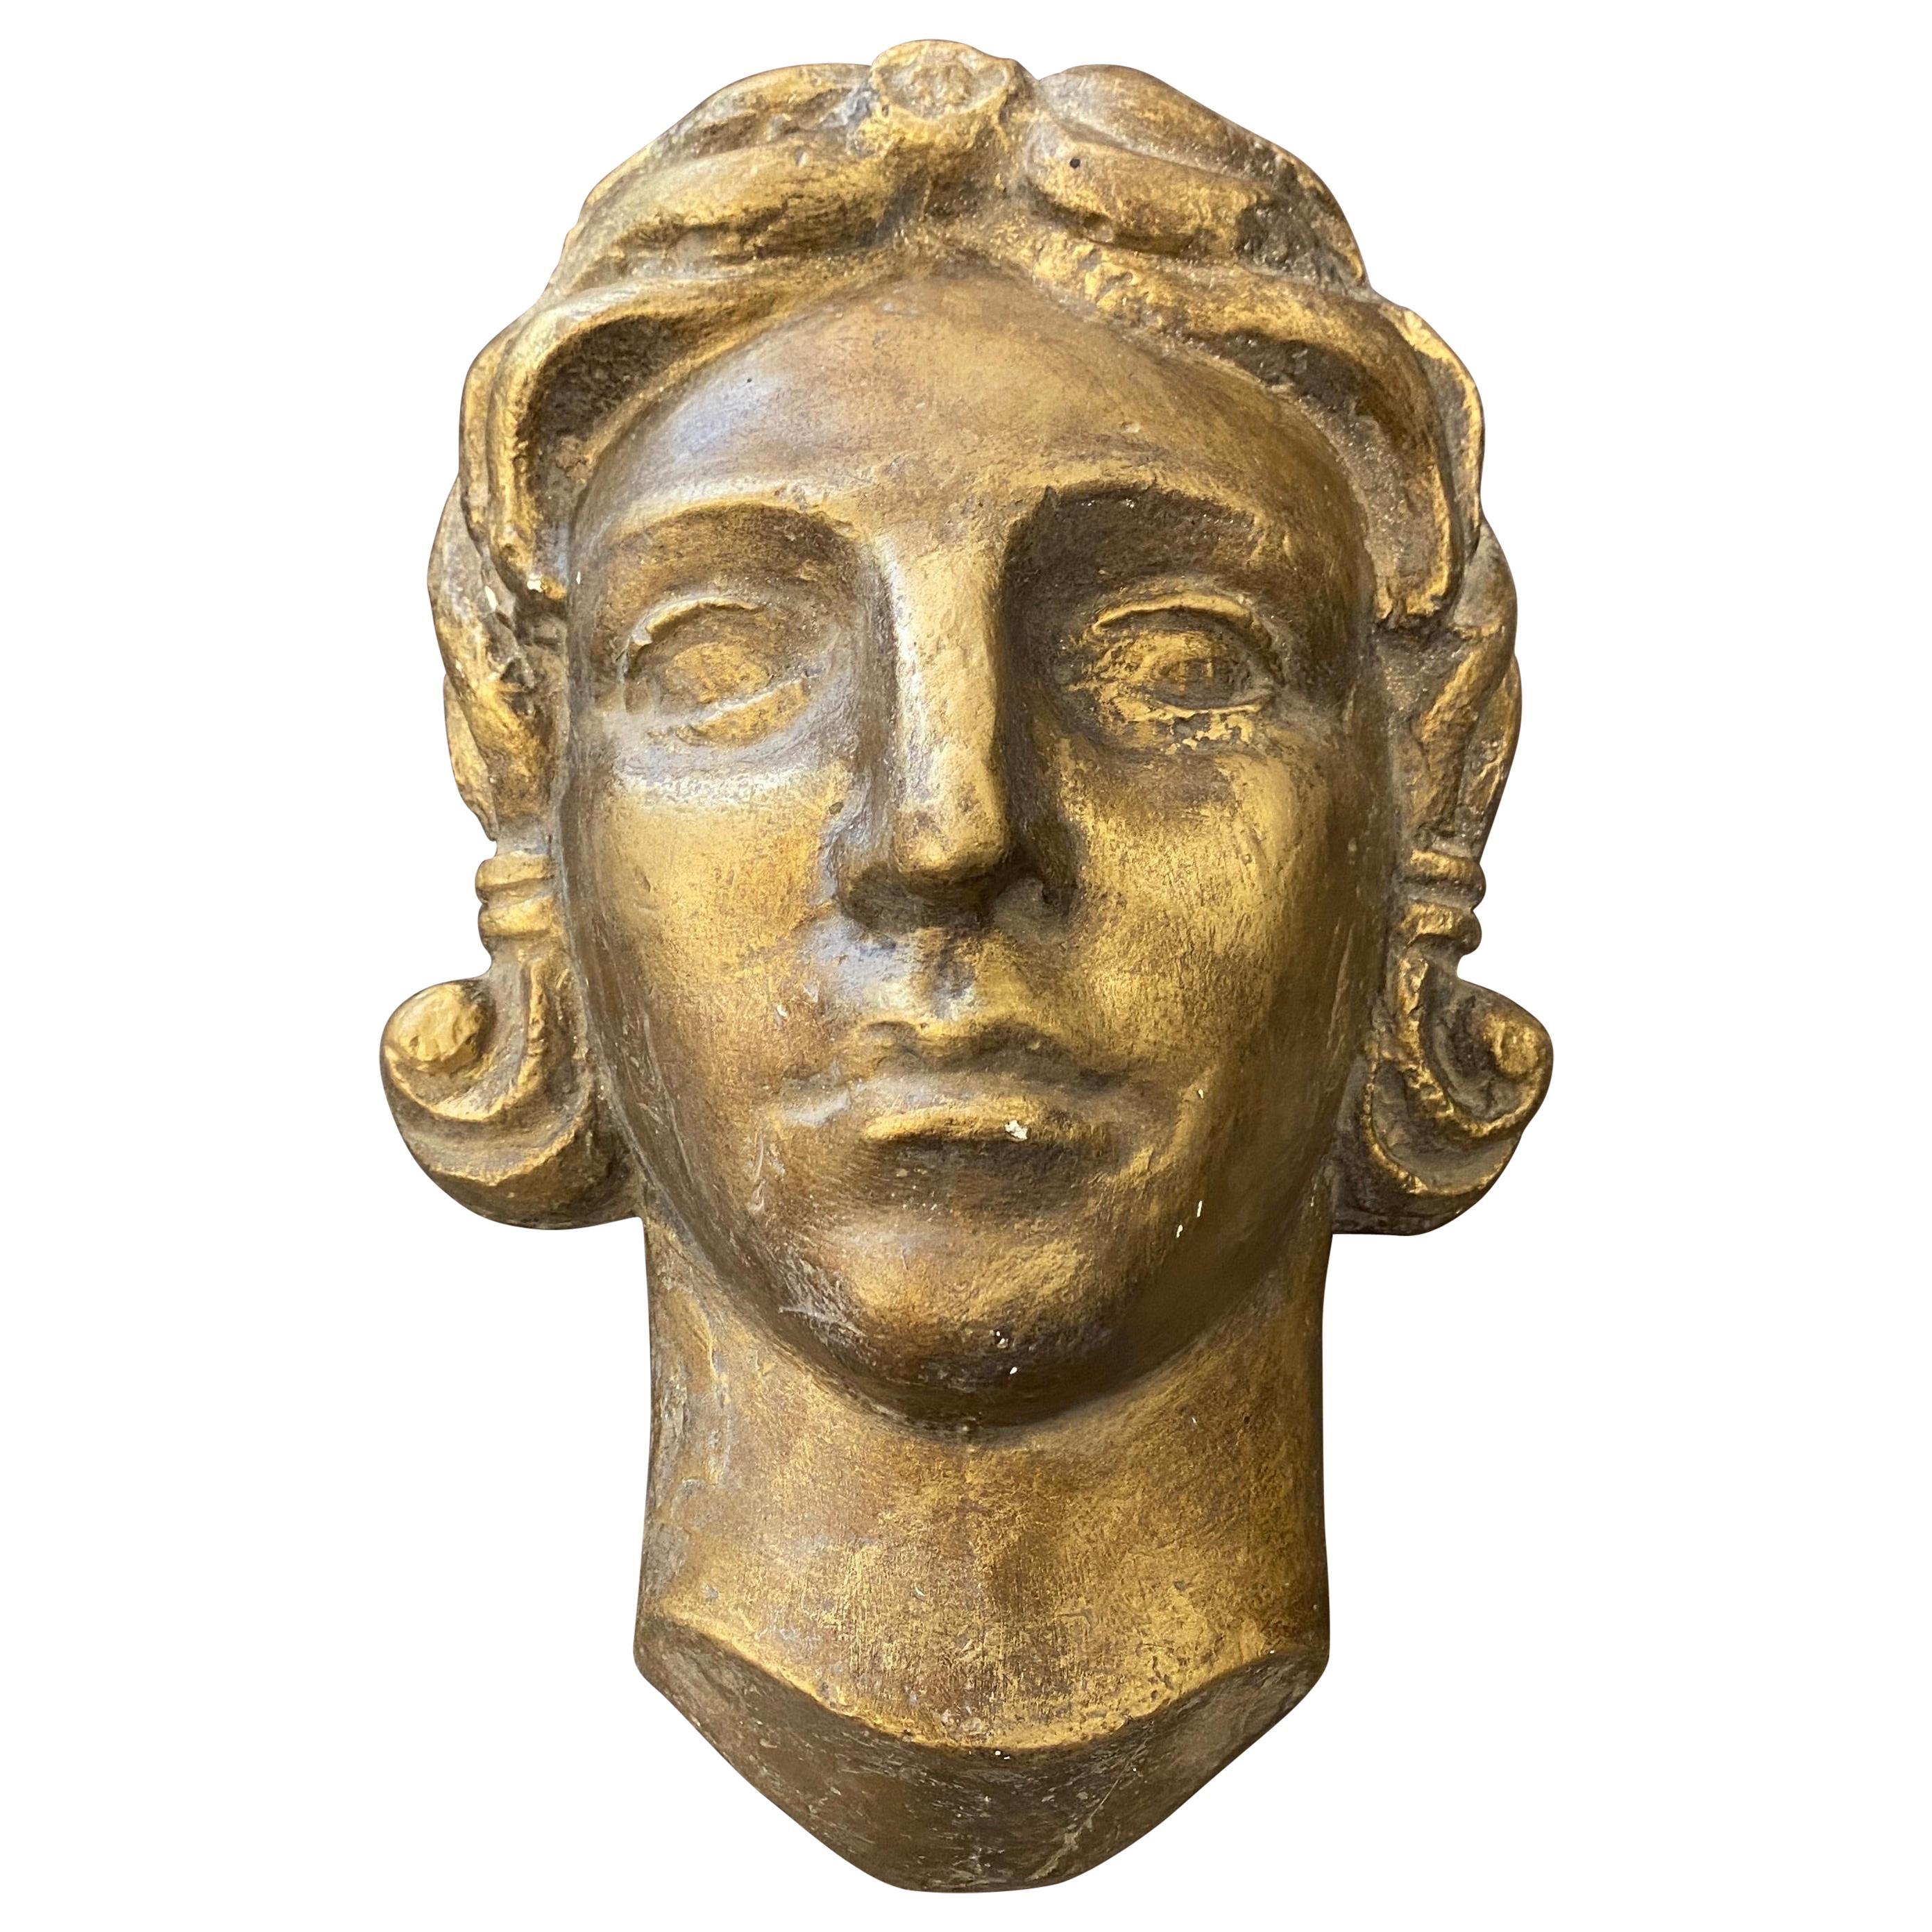 1930s Art Deco Gilded Plaster Italian Sculpture of an Head